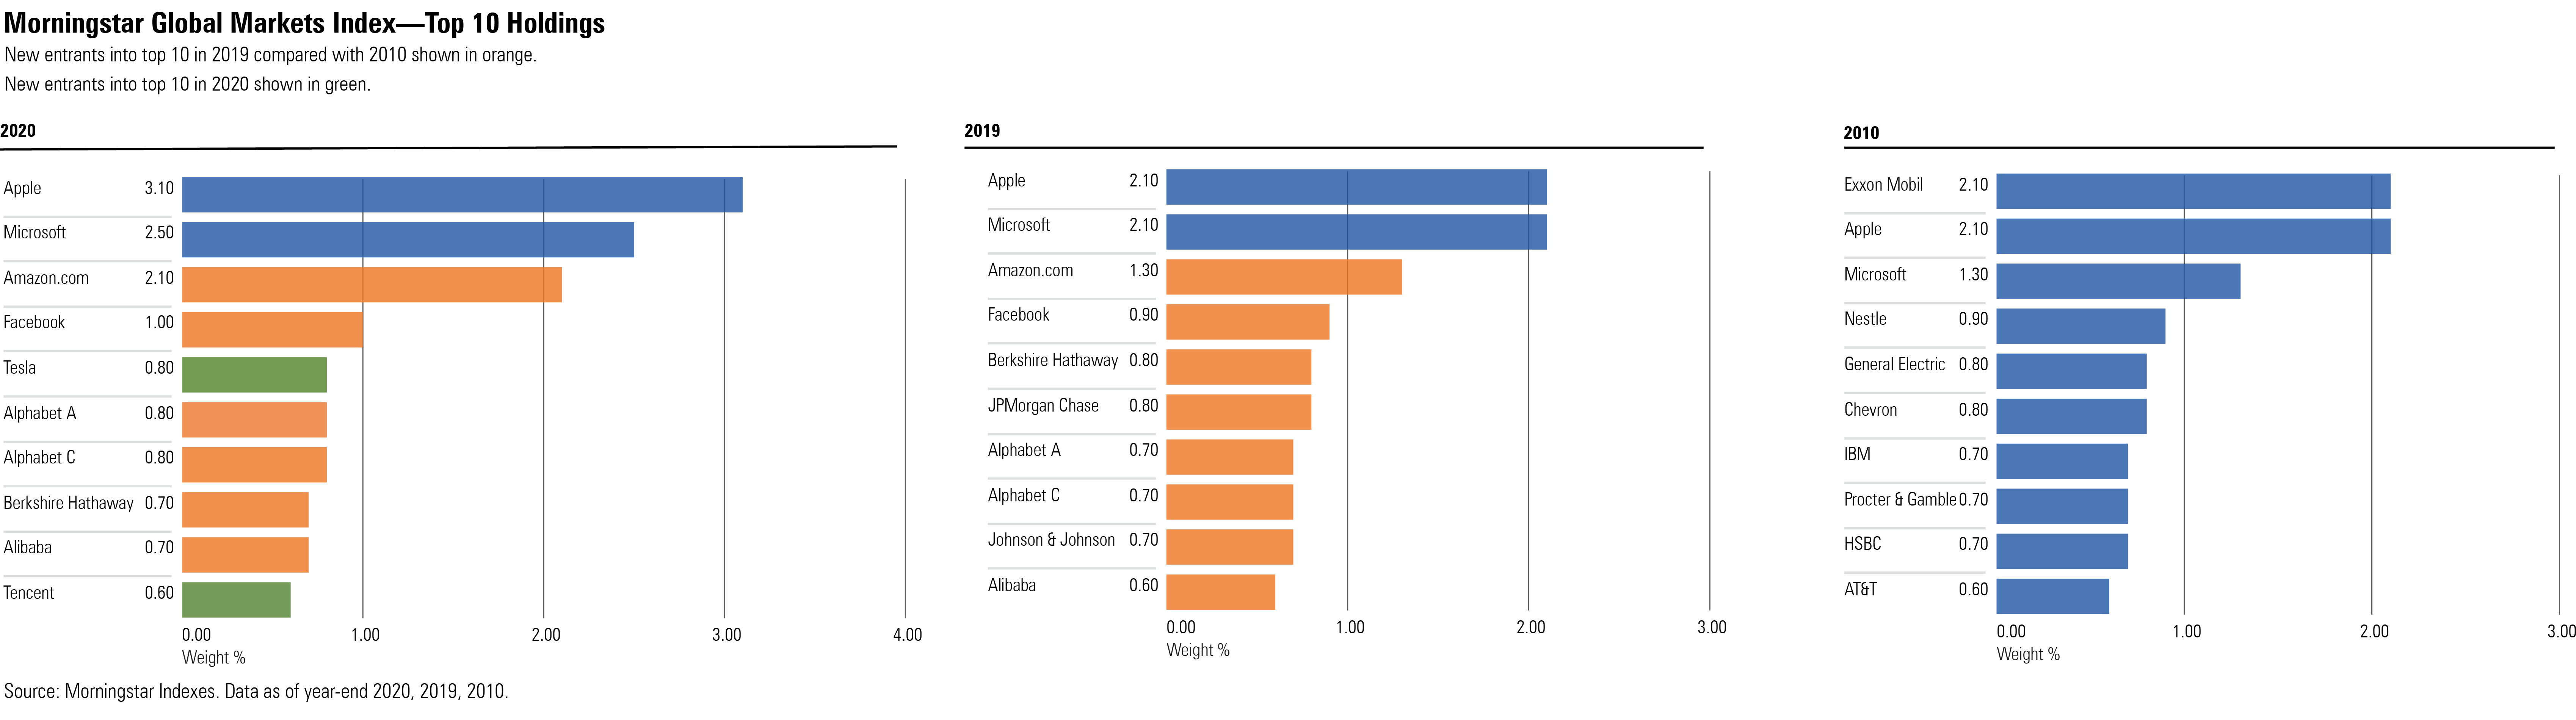 Morningstar US Market index - top 10 holdings